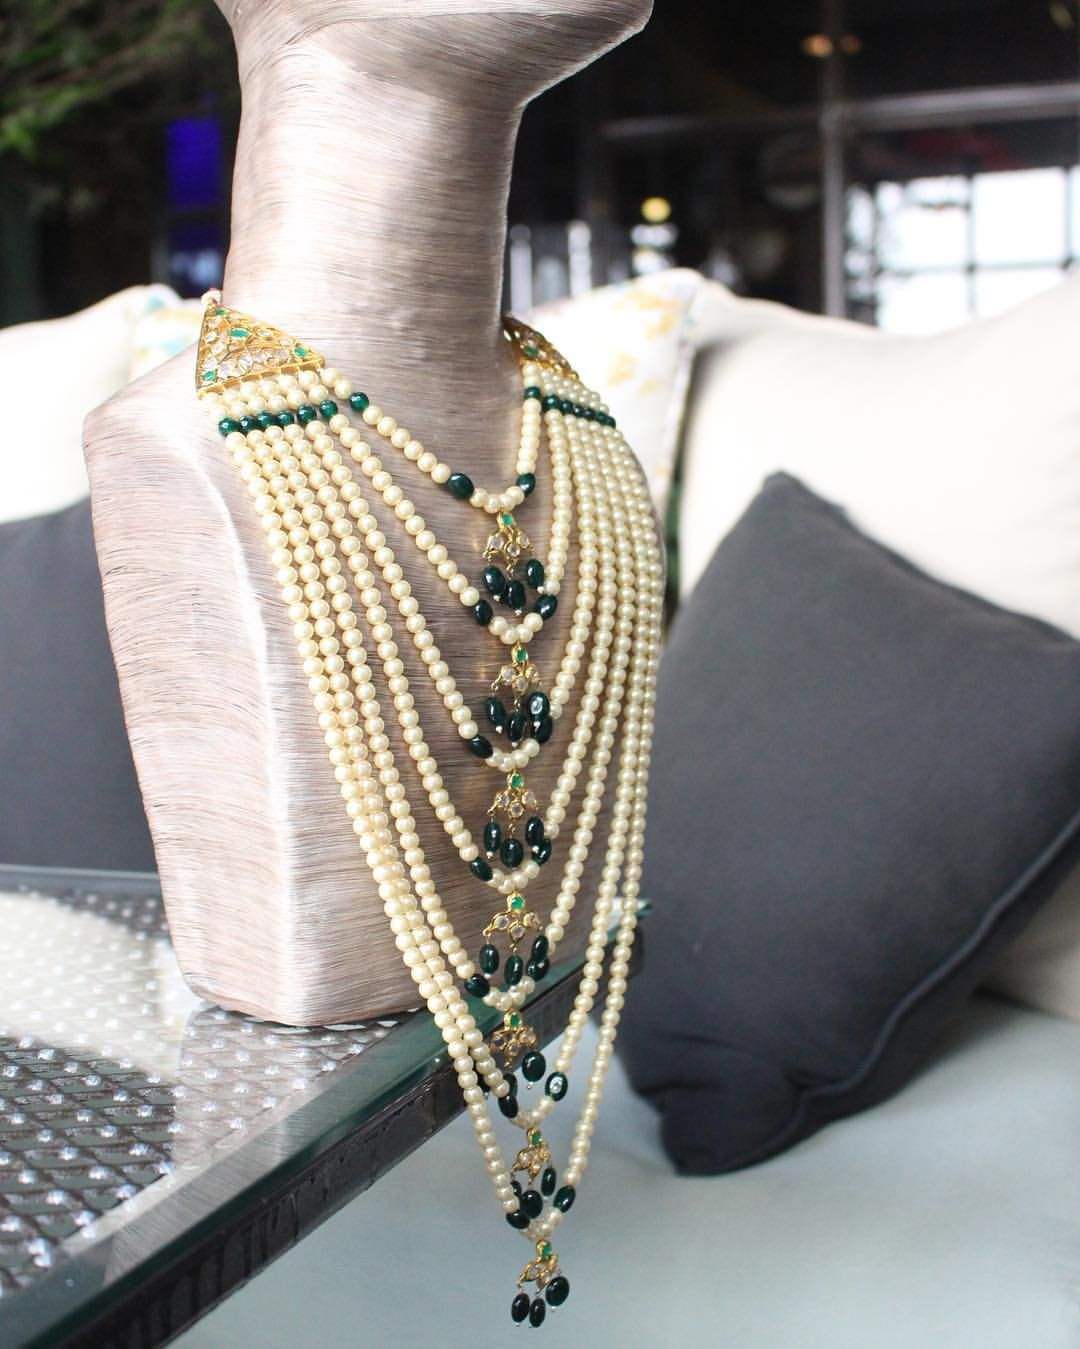 Instagram Photo By R Personal Shopper Apr 3 2016 At 4 14am Utc Personal Shopper Statement Necklace Shopper